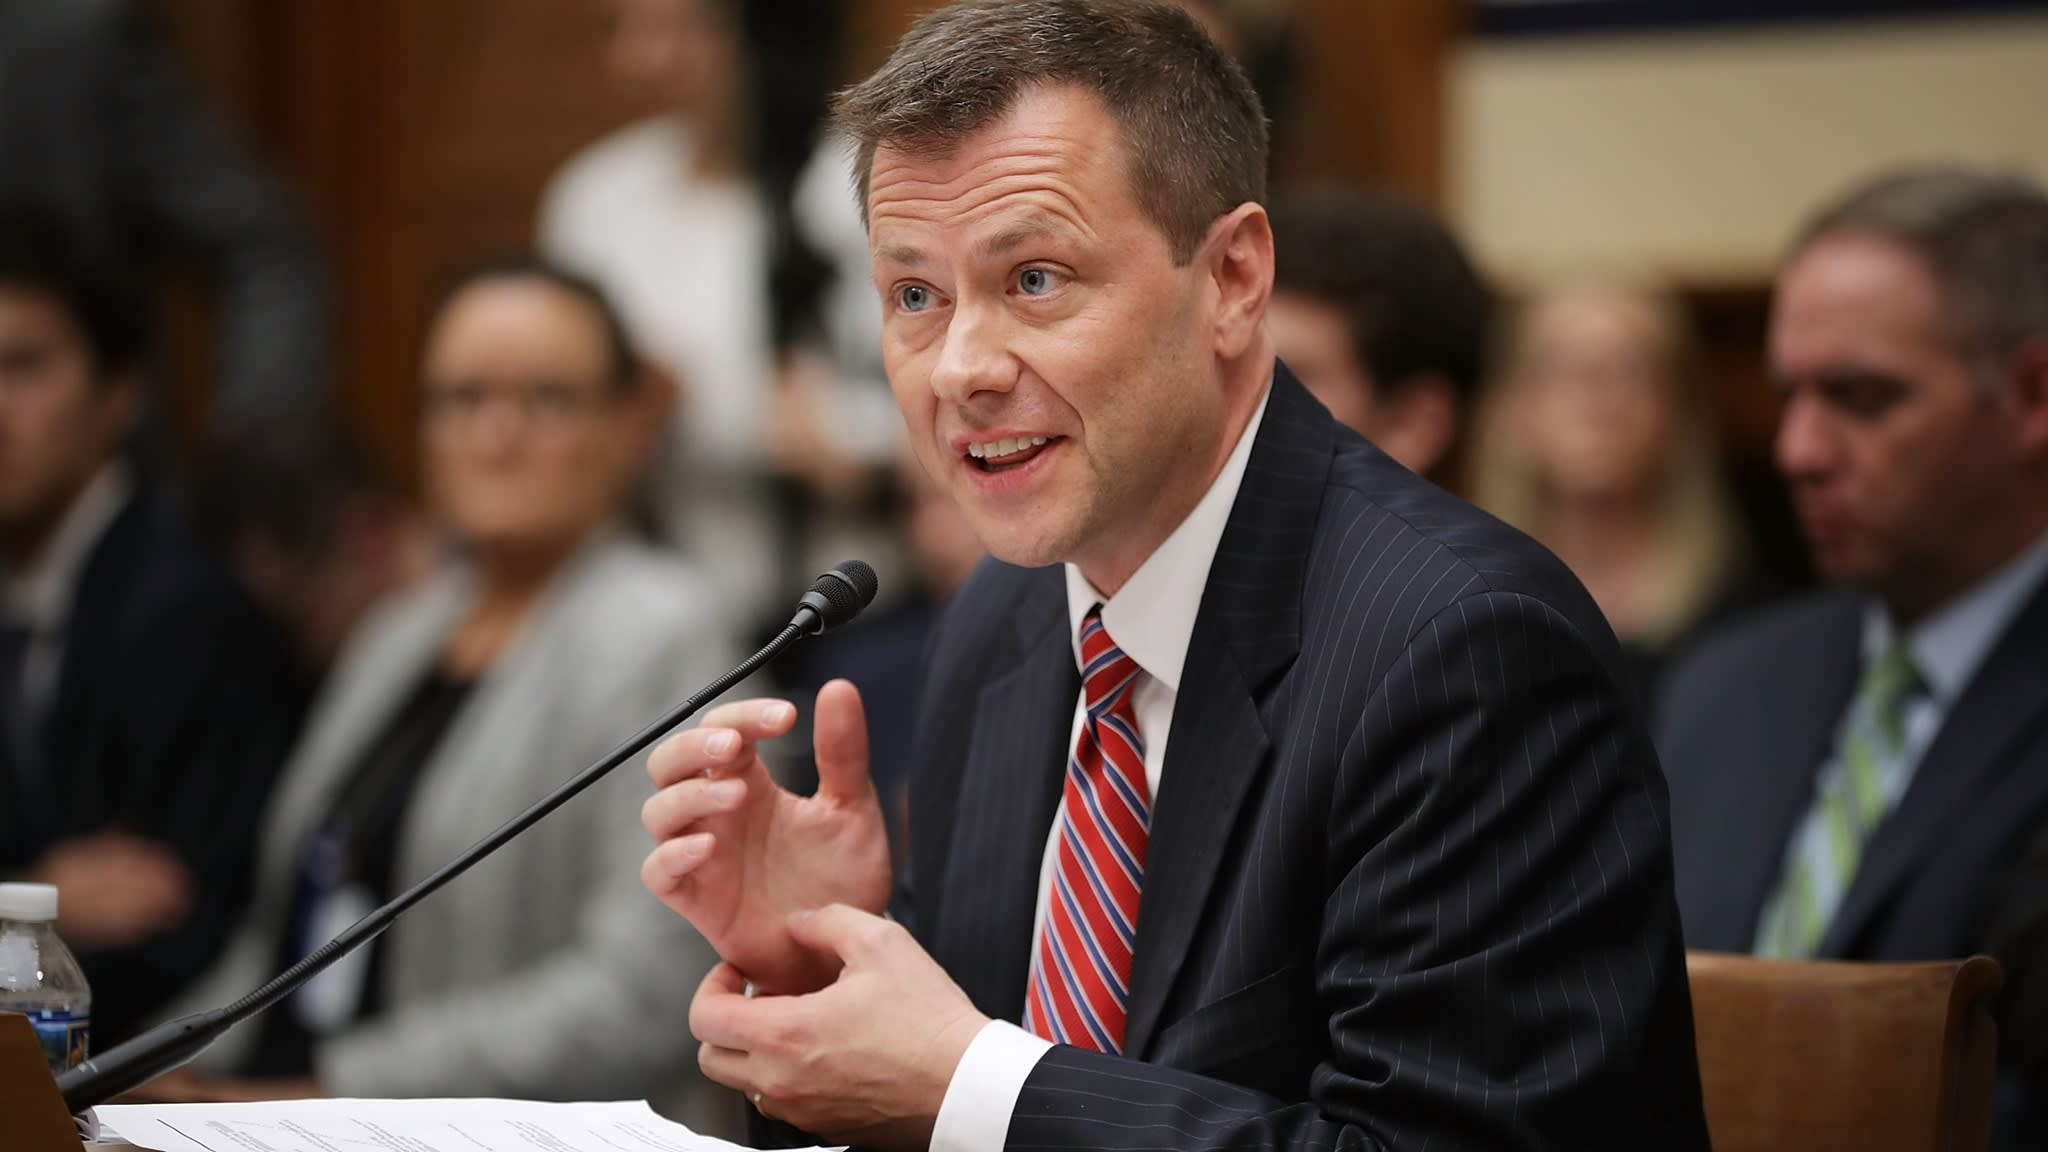 FBI fires agent who sent anti-Trump messages